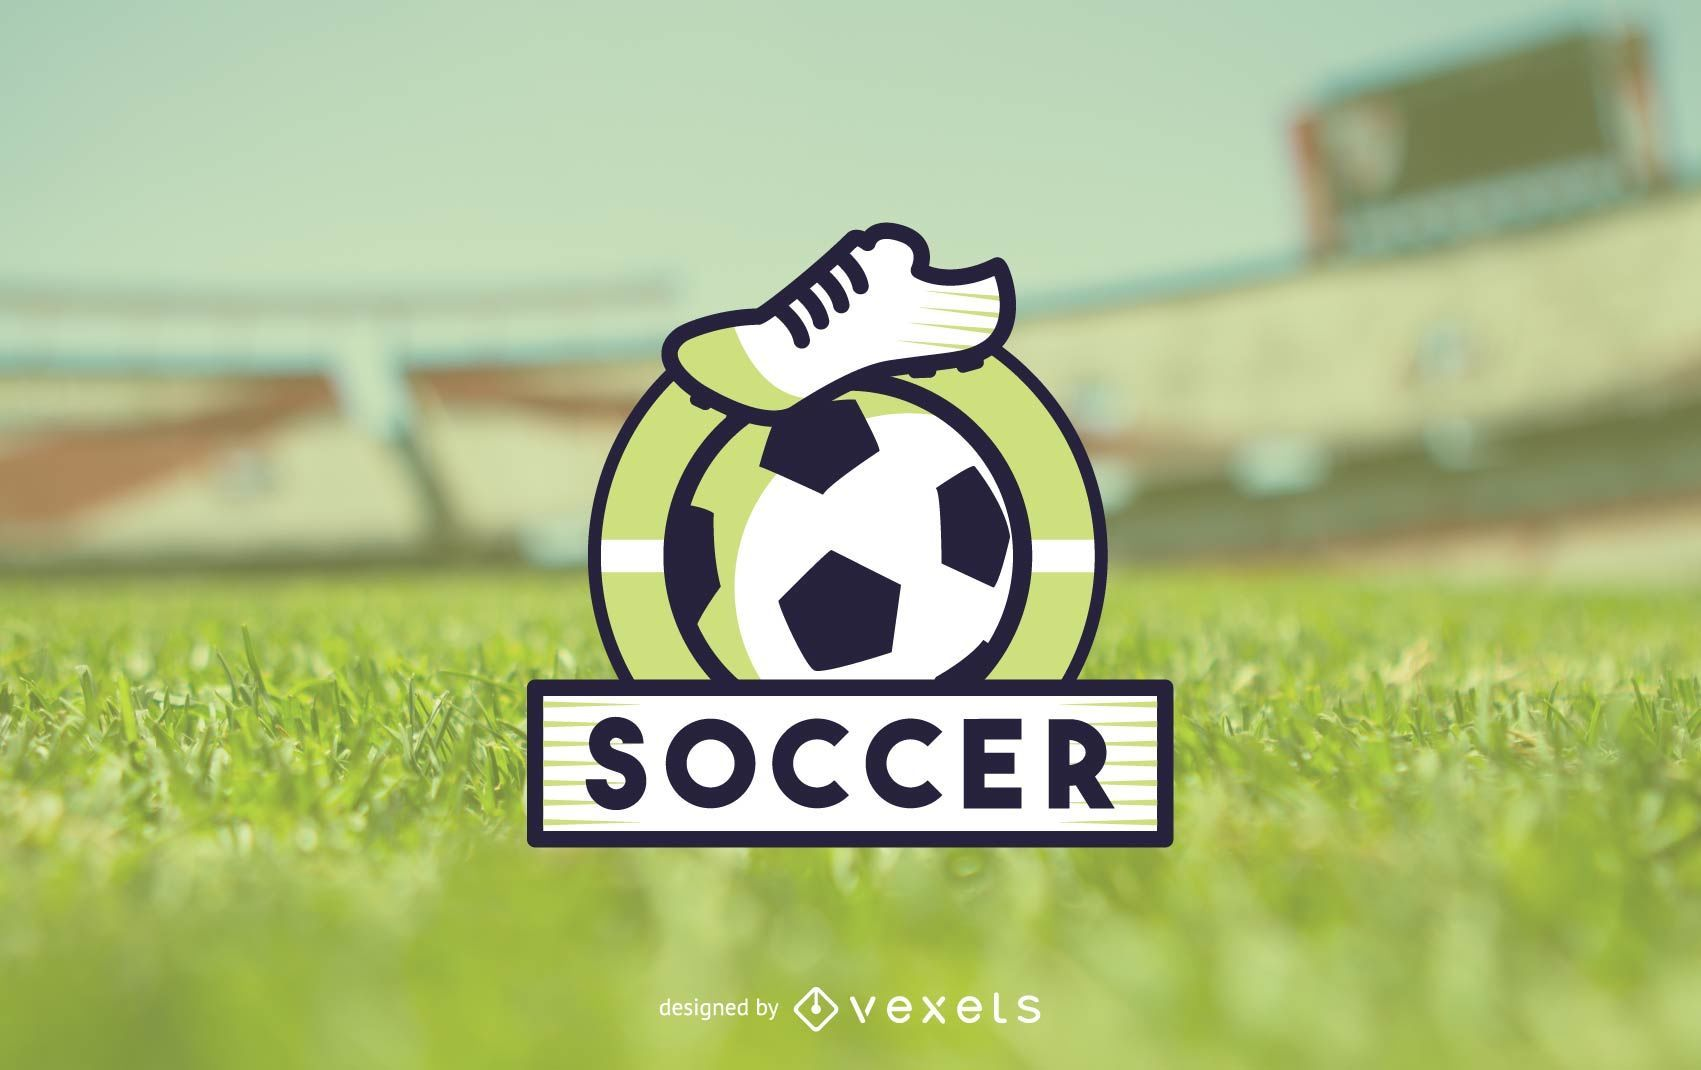 Modelo de logotipo de futebol